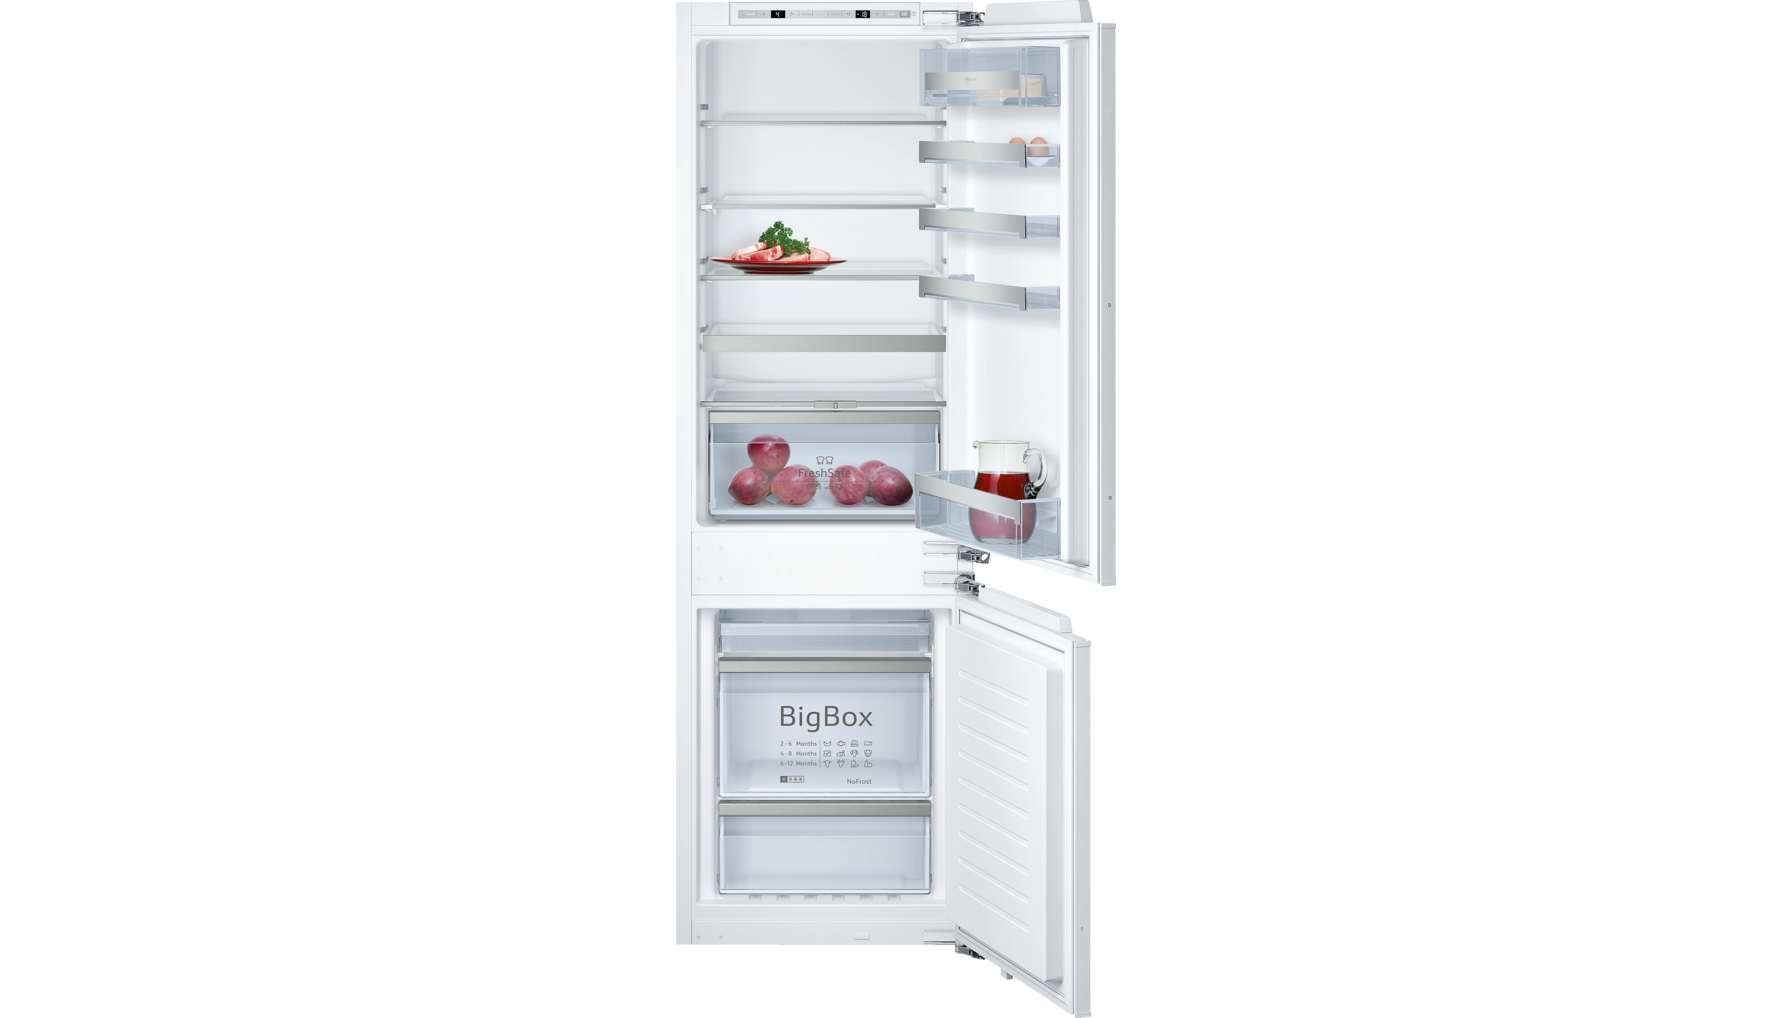 product showroom fridges and freezers fridge freezers. Black Bedroom Furniture Sets. Home Design Ideas